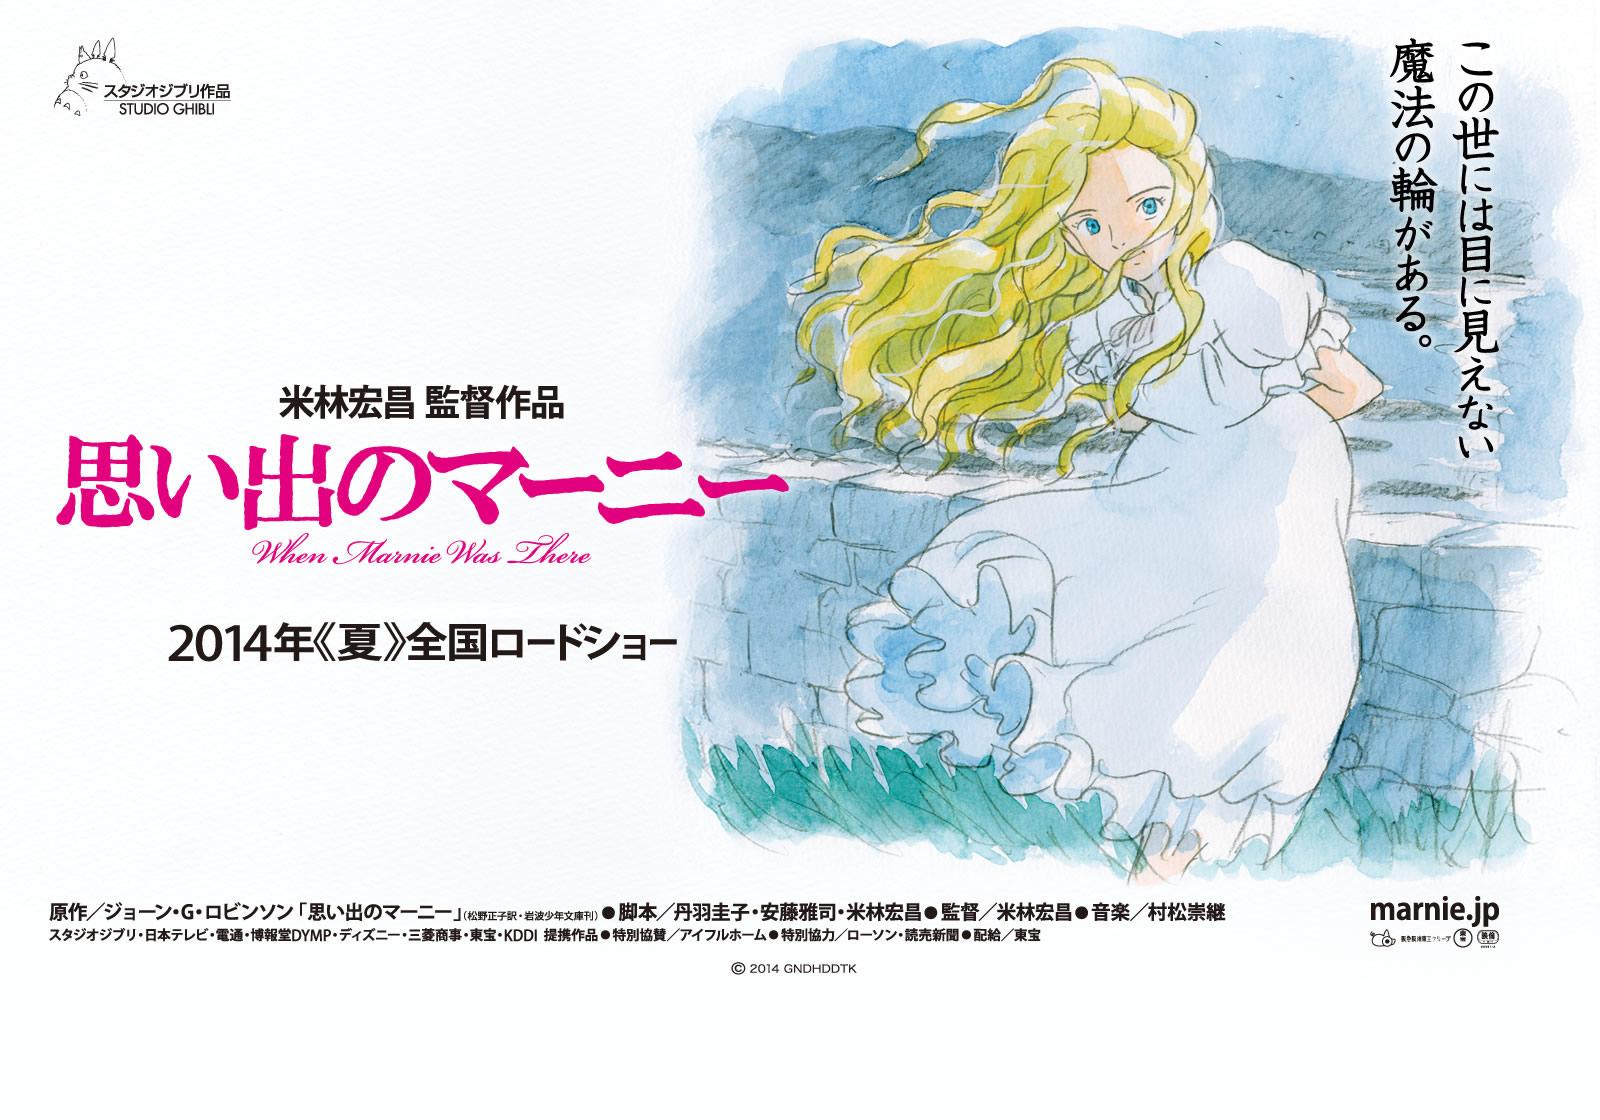 http://www.manga-news.com/public/2013/newsjp/decembre/marnie.jpg